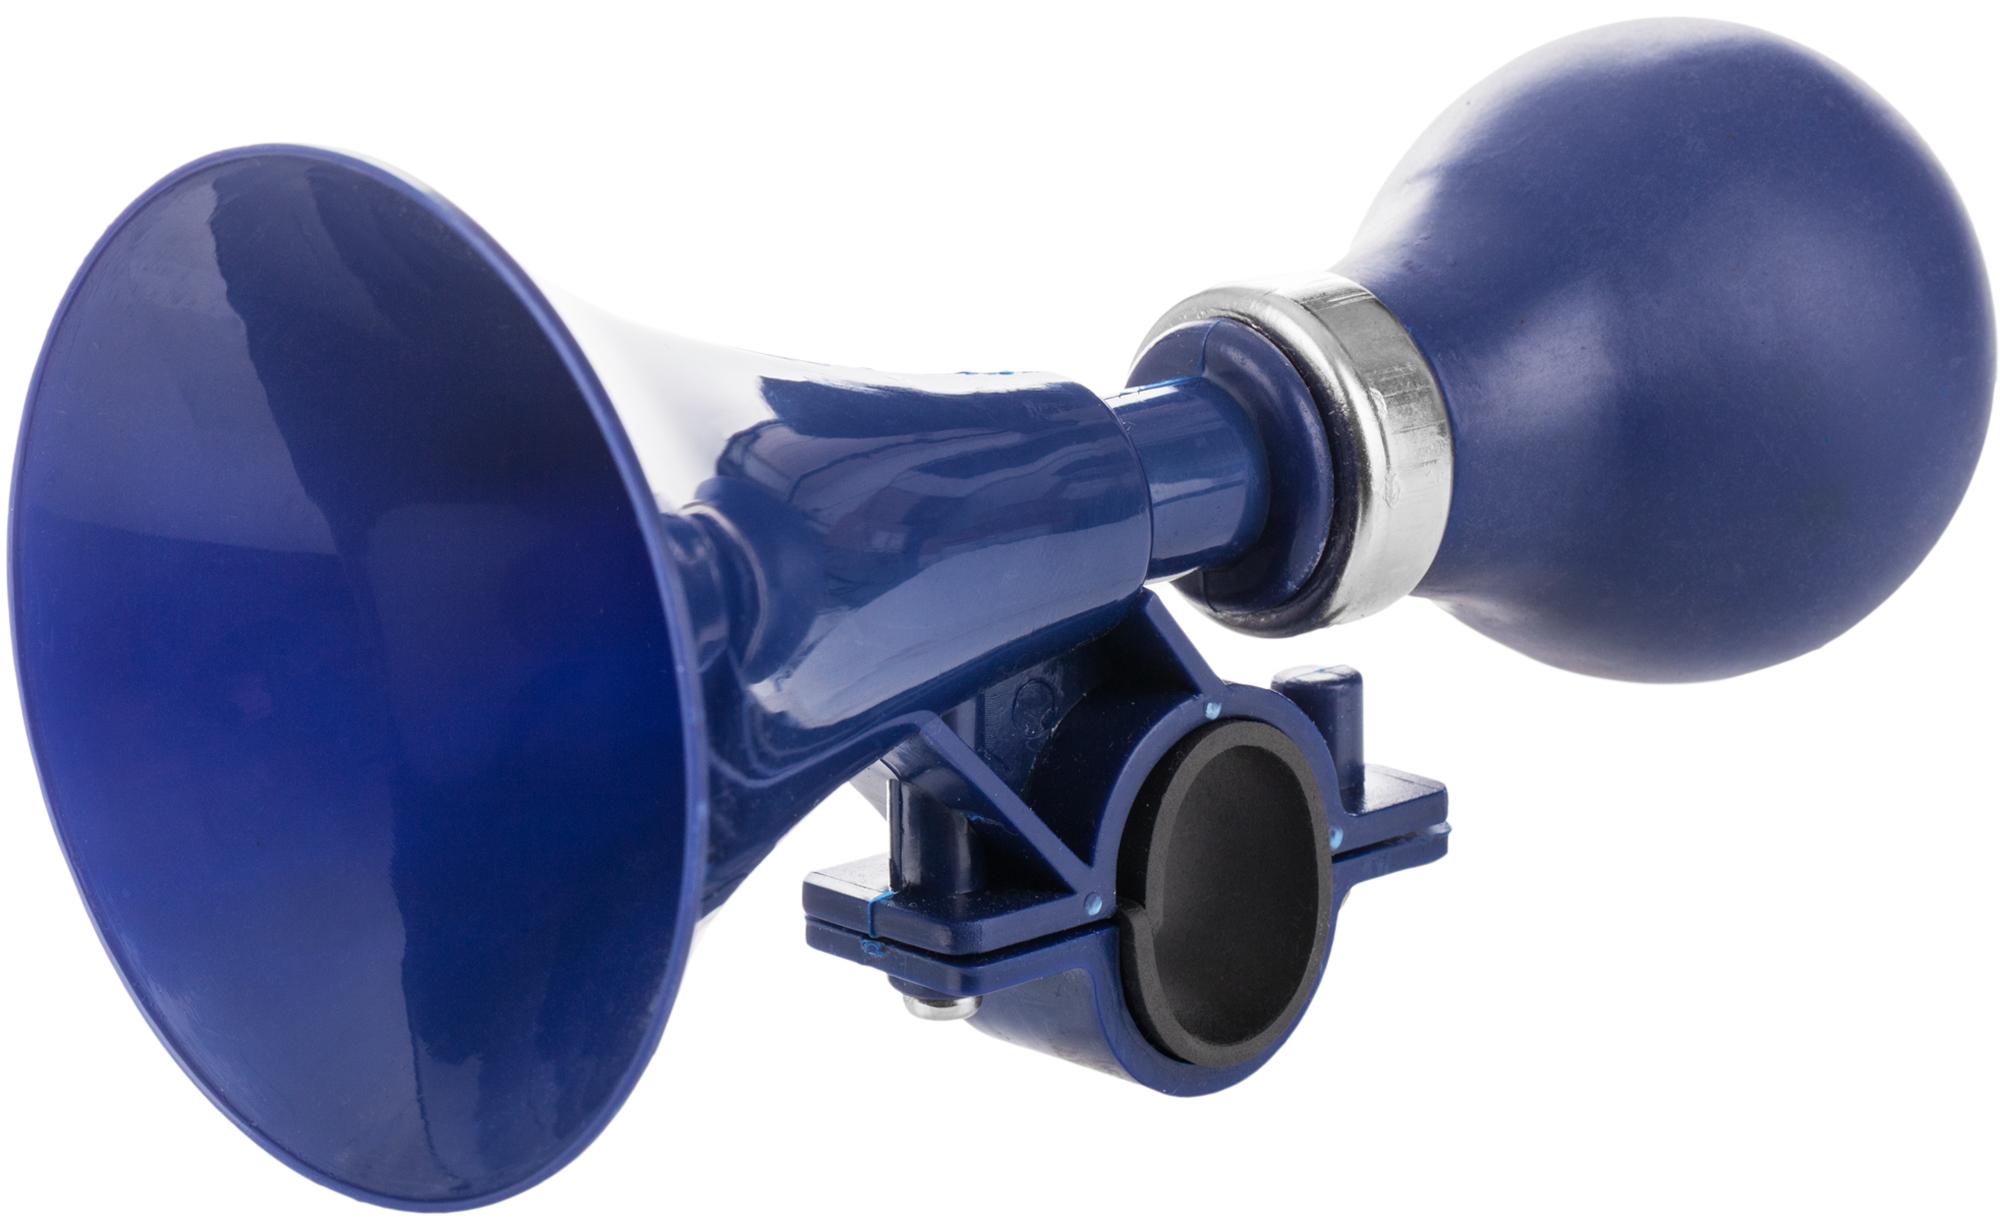 Stern Гудок детский Stern, размер Без размера stern stern compact 16 2017 размер 150 185